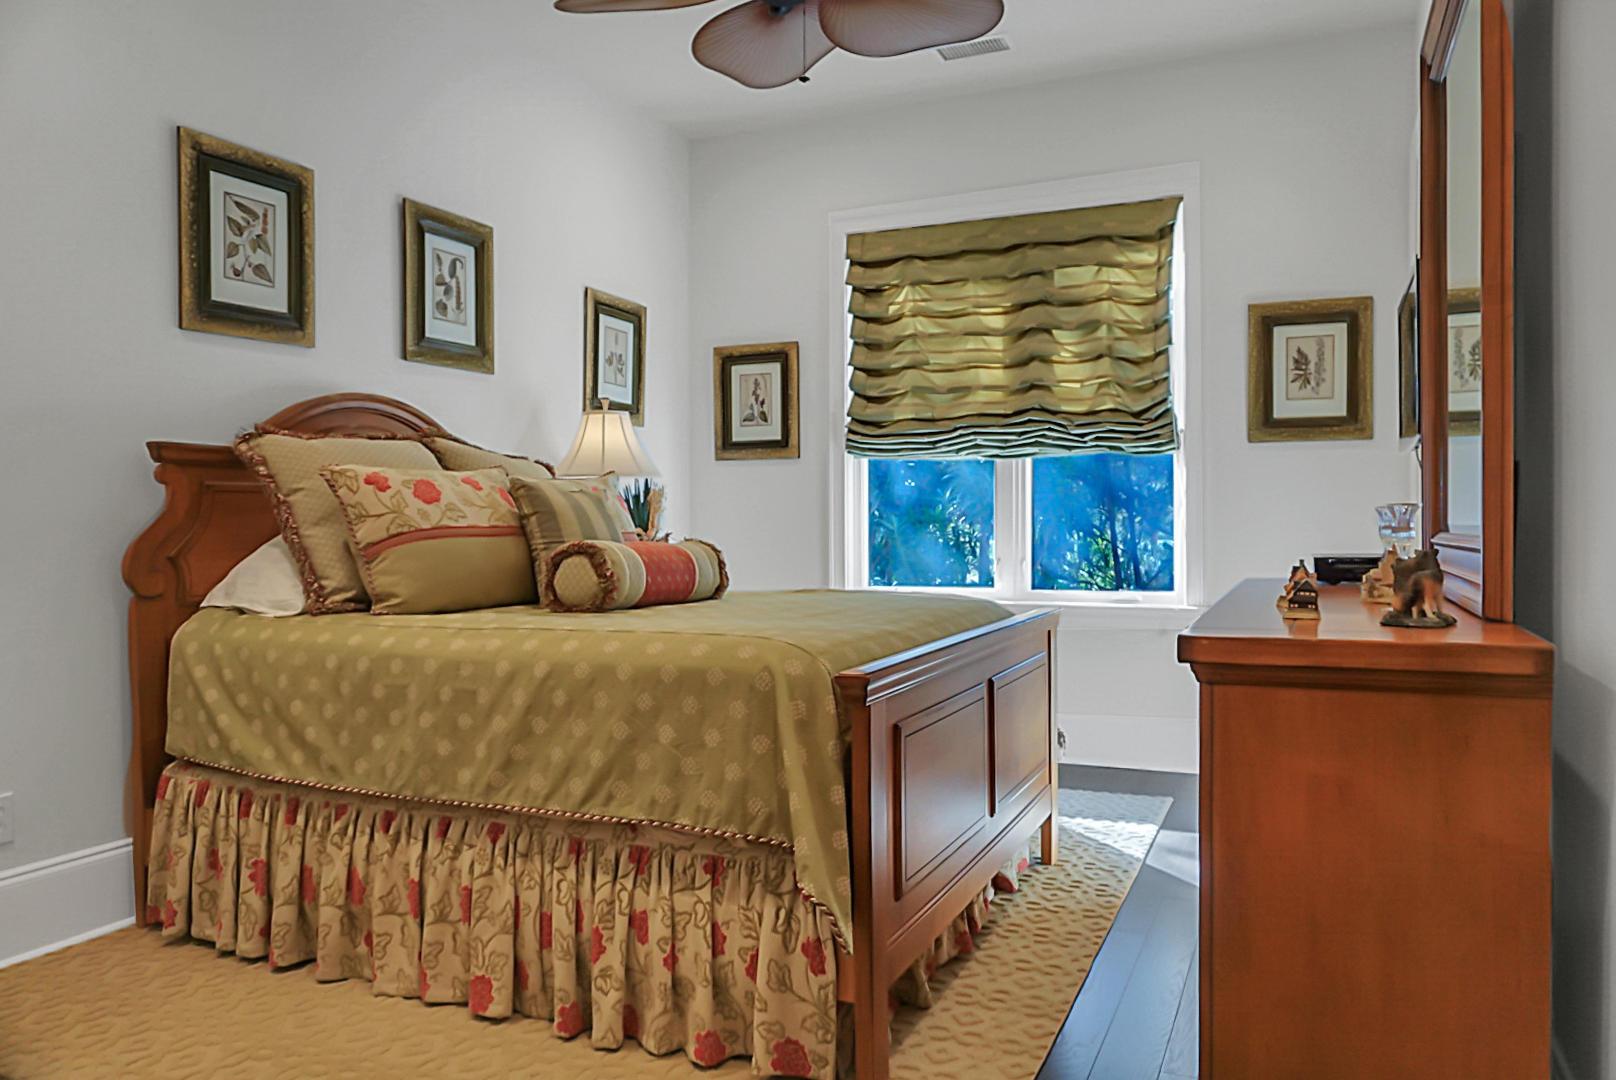 Dunes West Homes For Sale - 2389 Darts Cove, Mount Pleasant, SC - 29